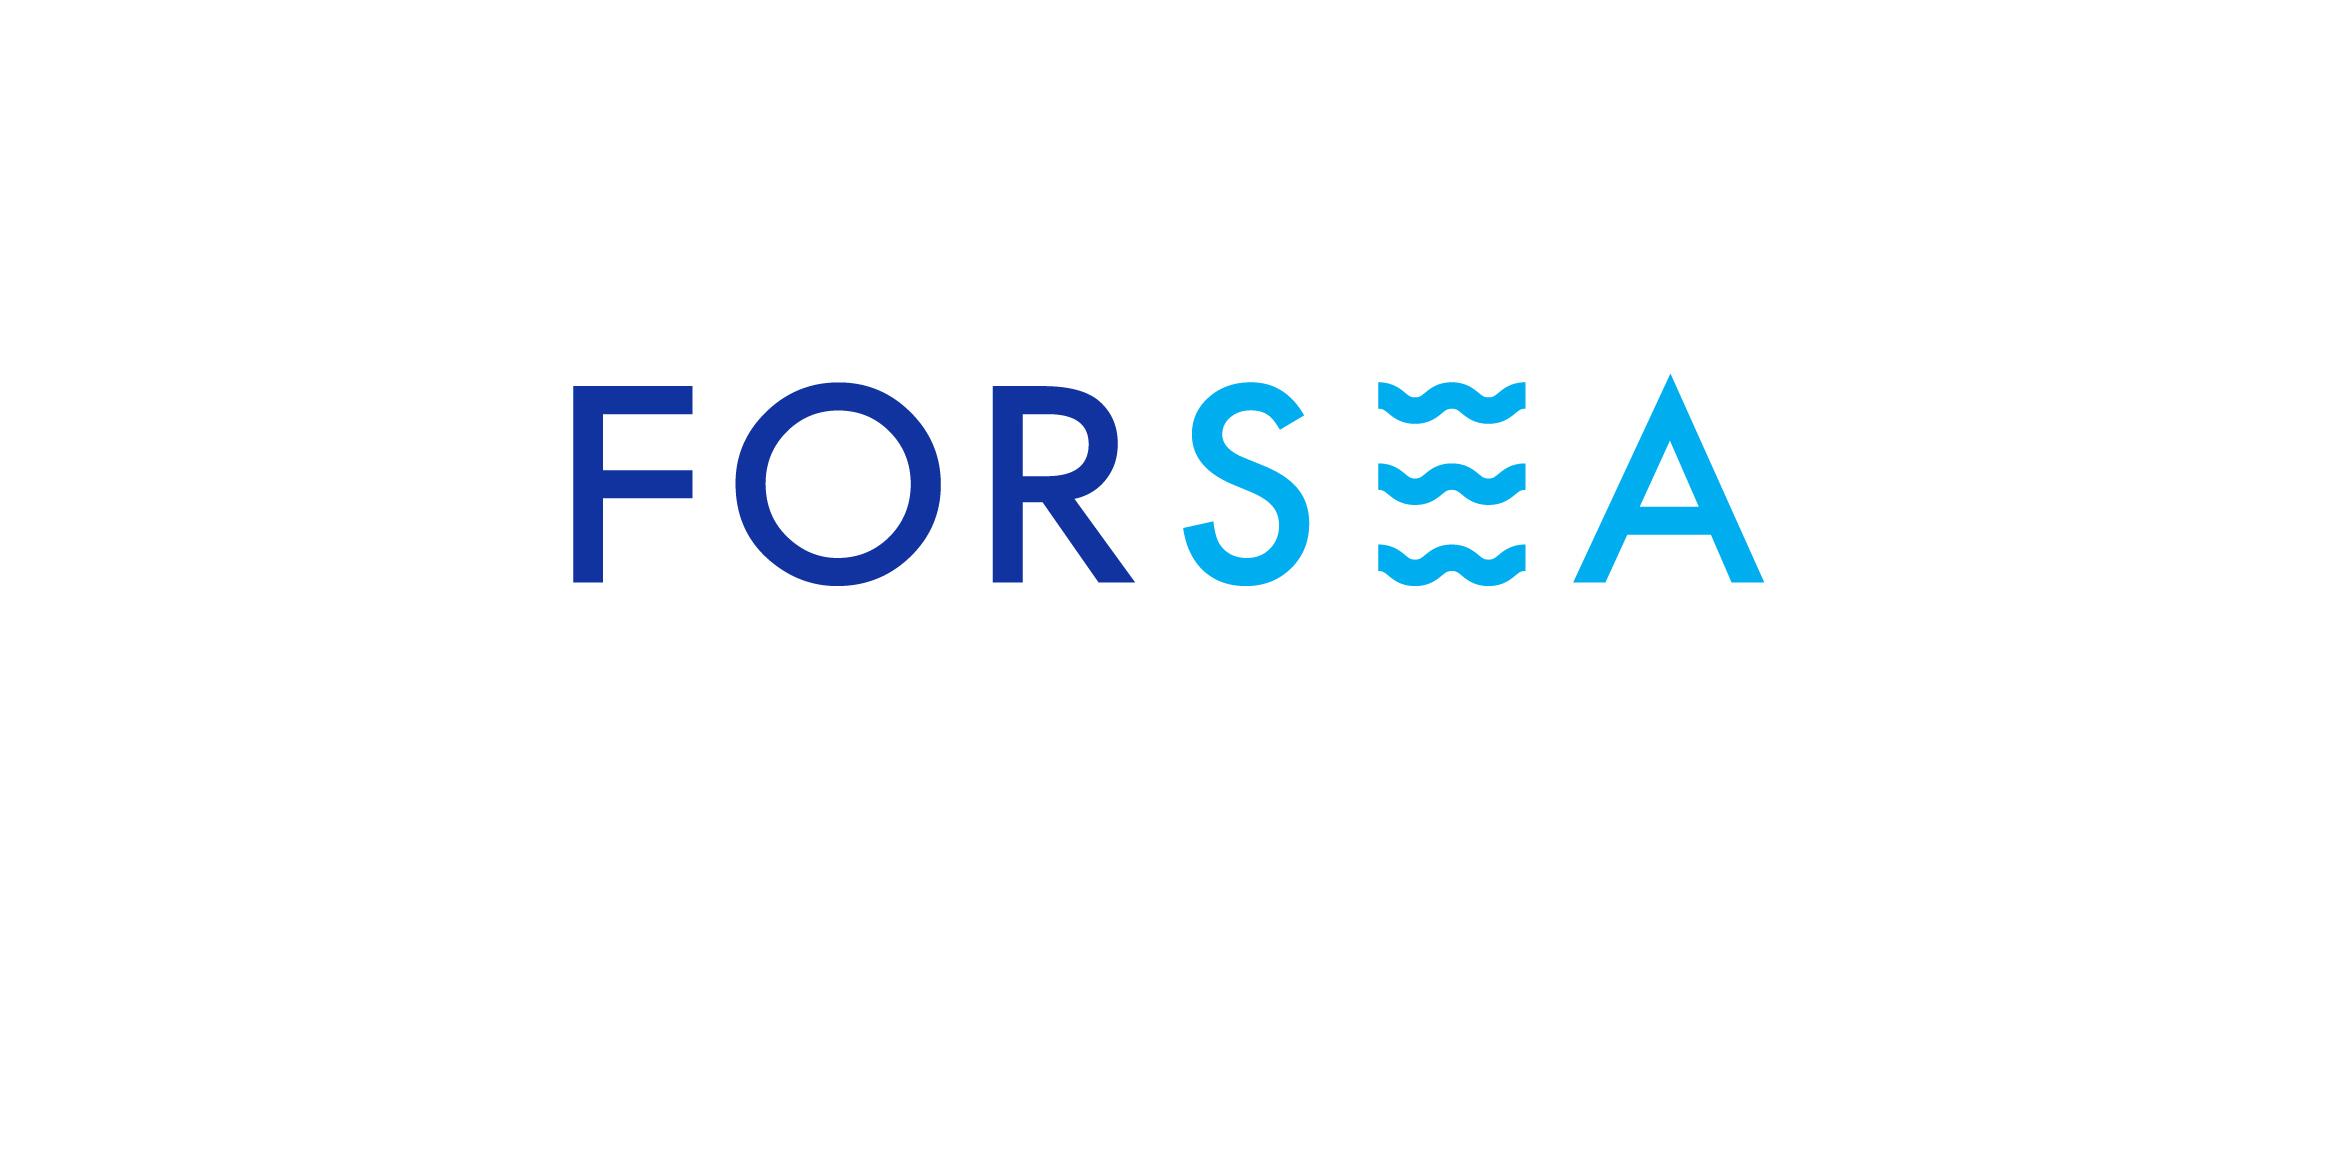 FORSEA logo SQUARESPACE.jpg